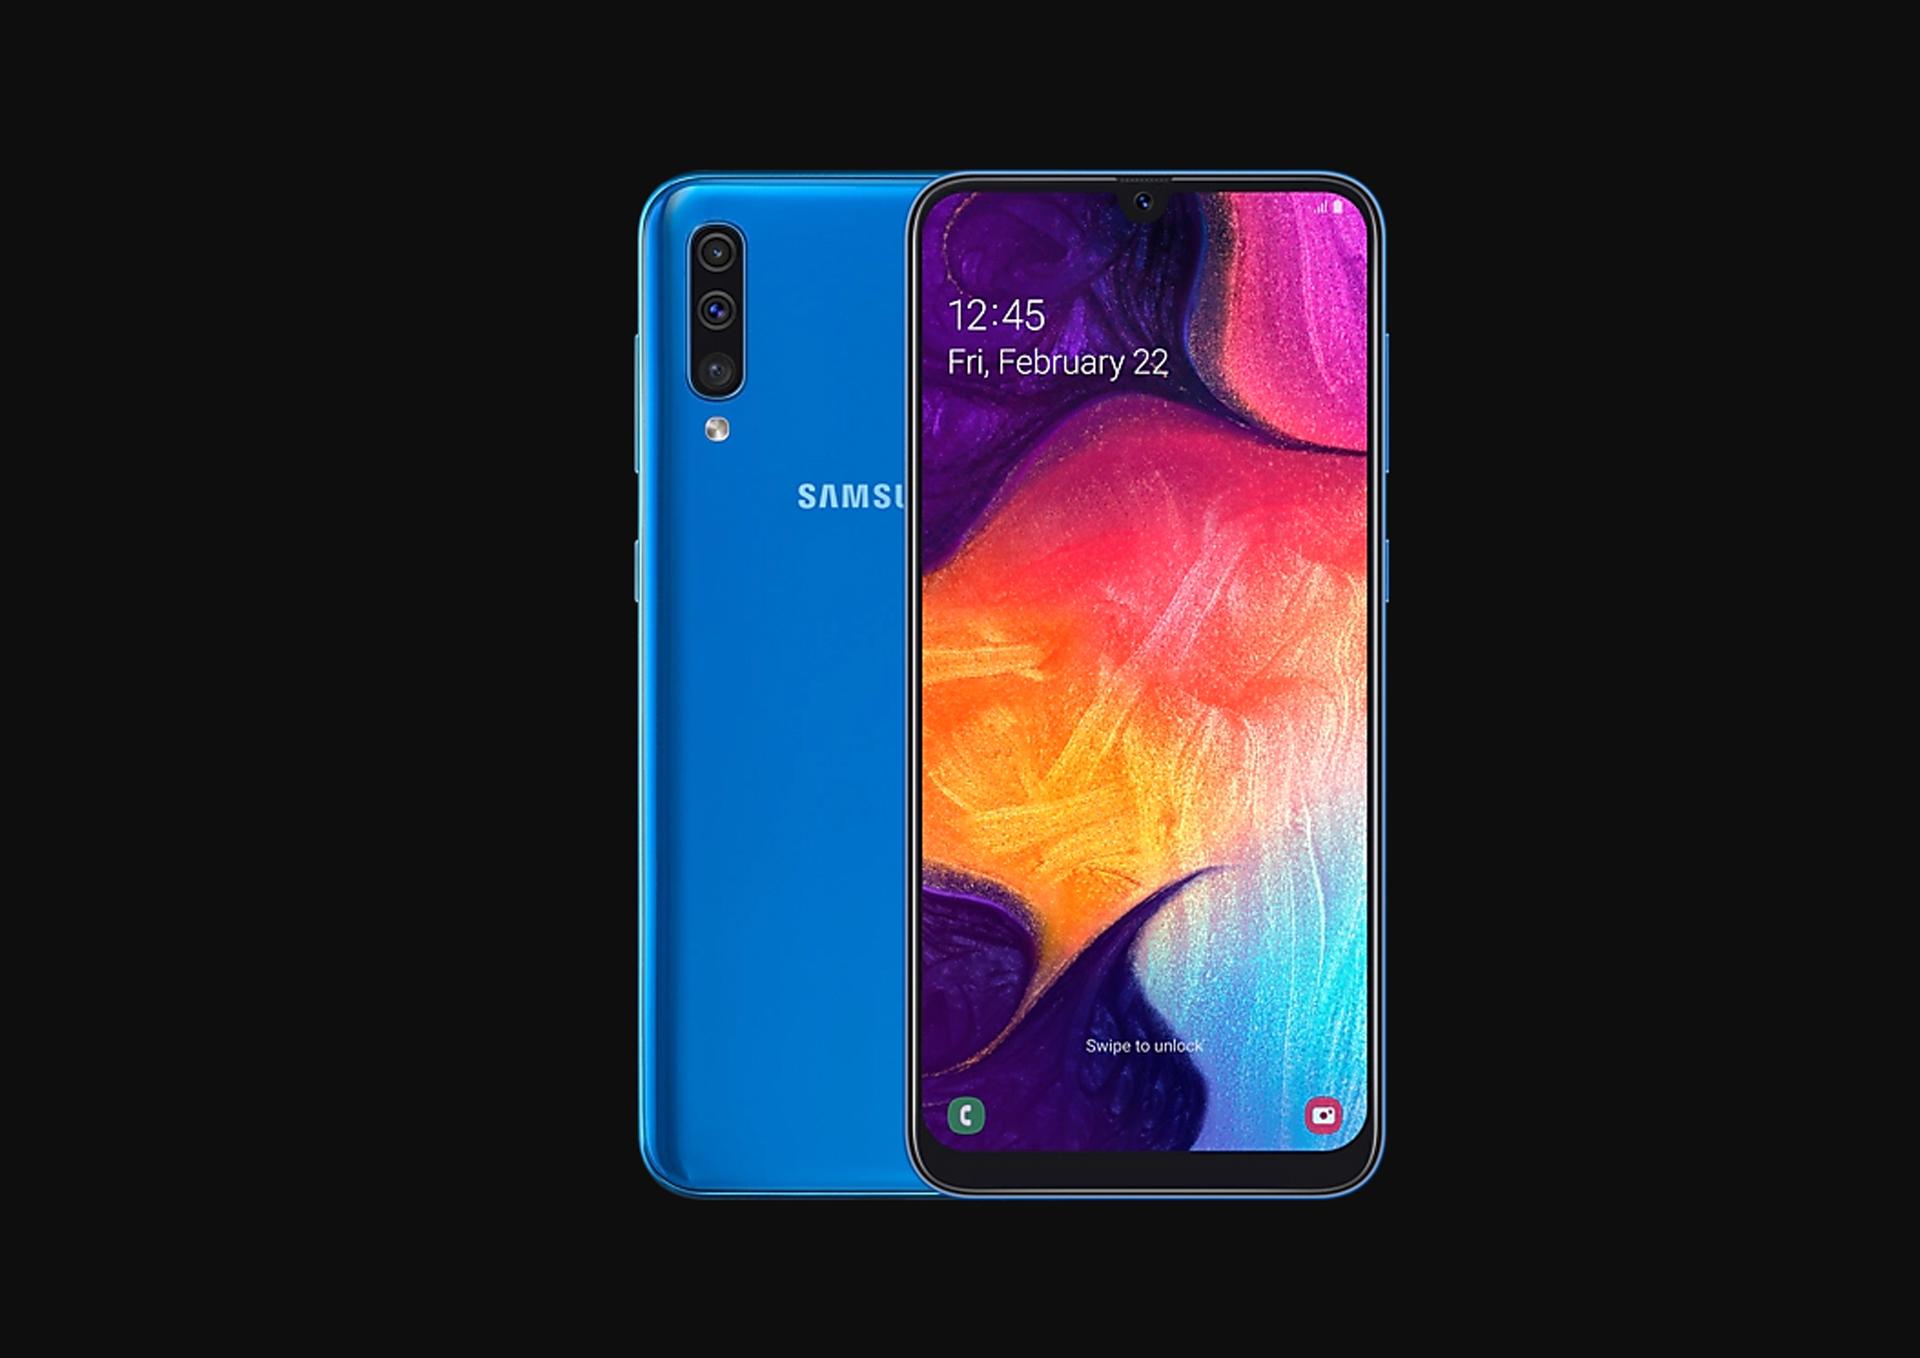 Samsung Galaxy A50: Video als Sperrbildschirm